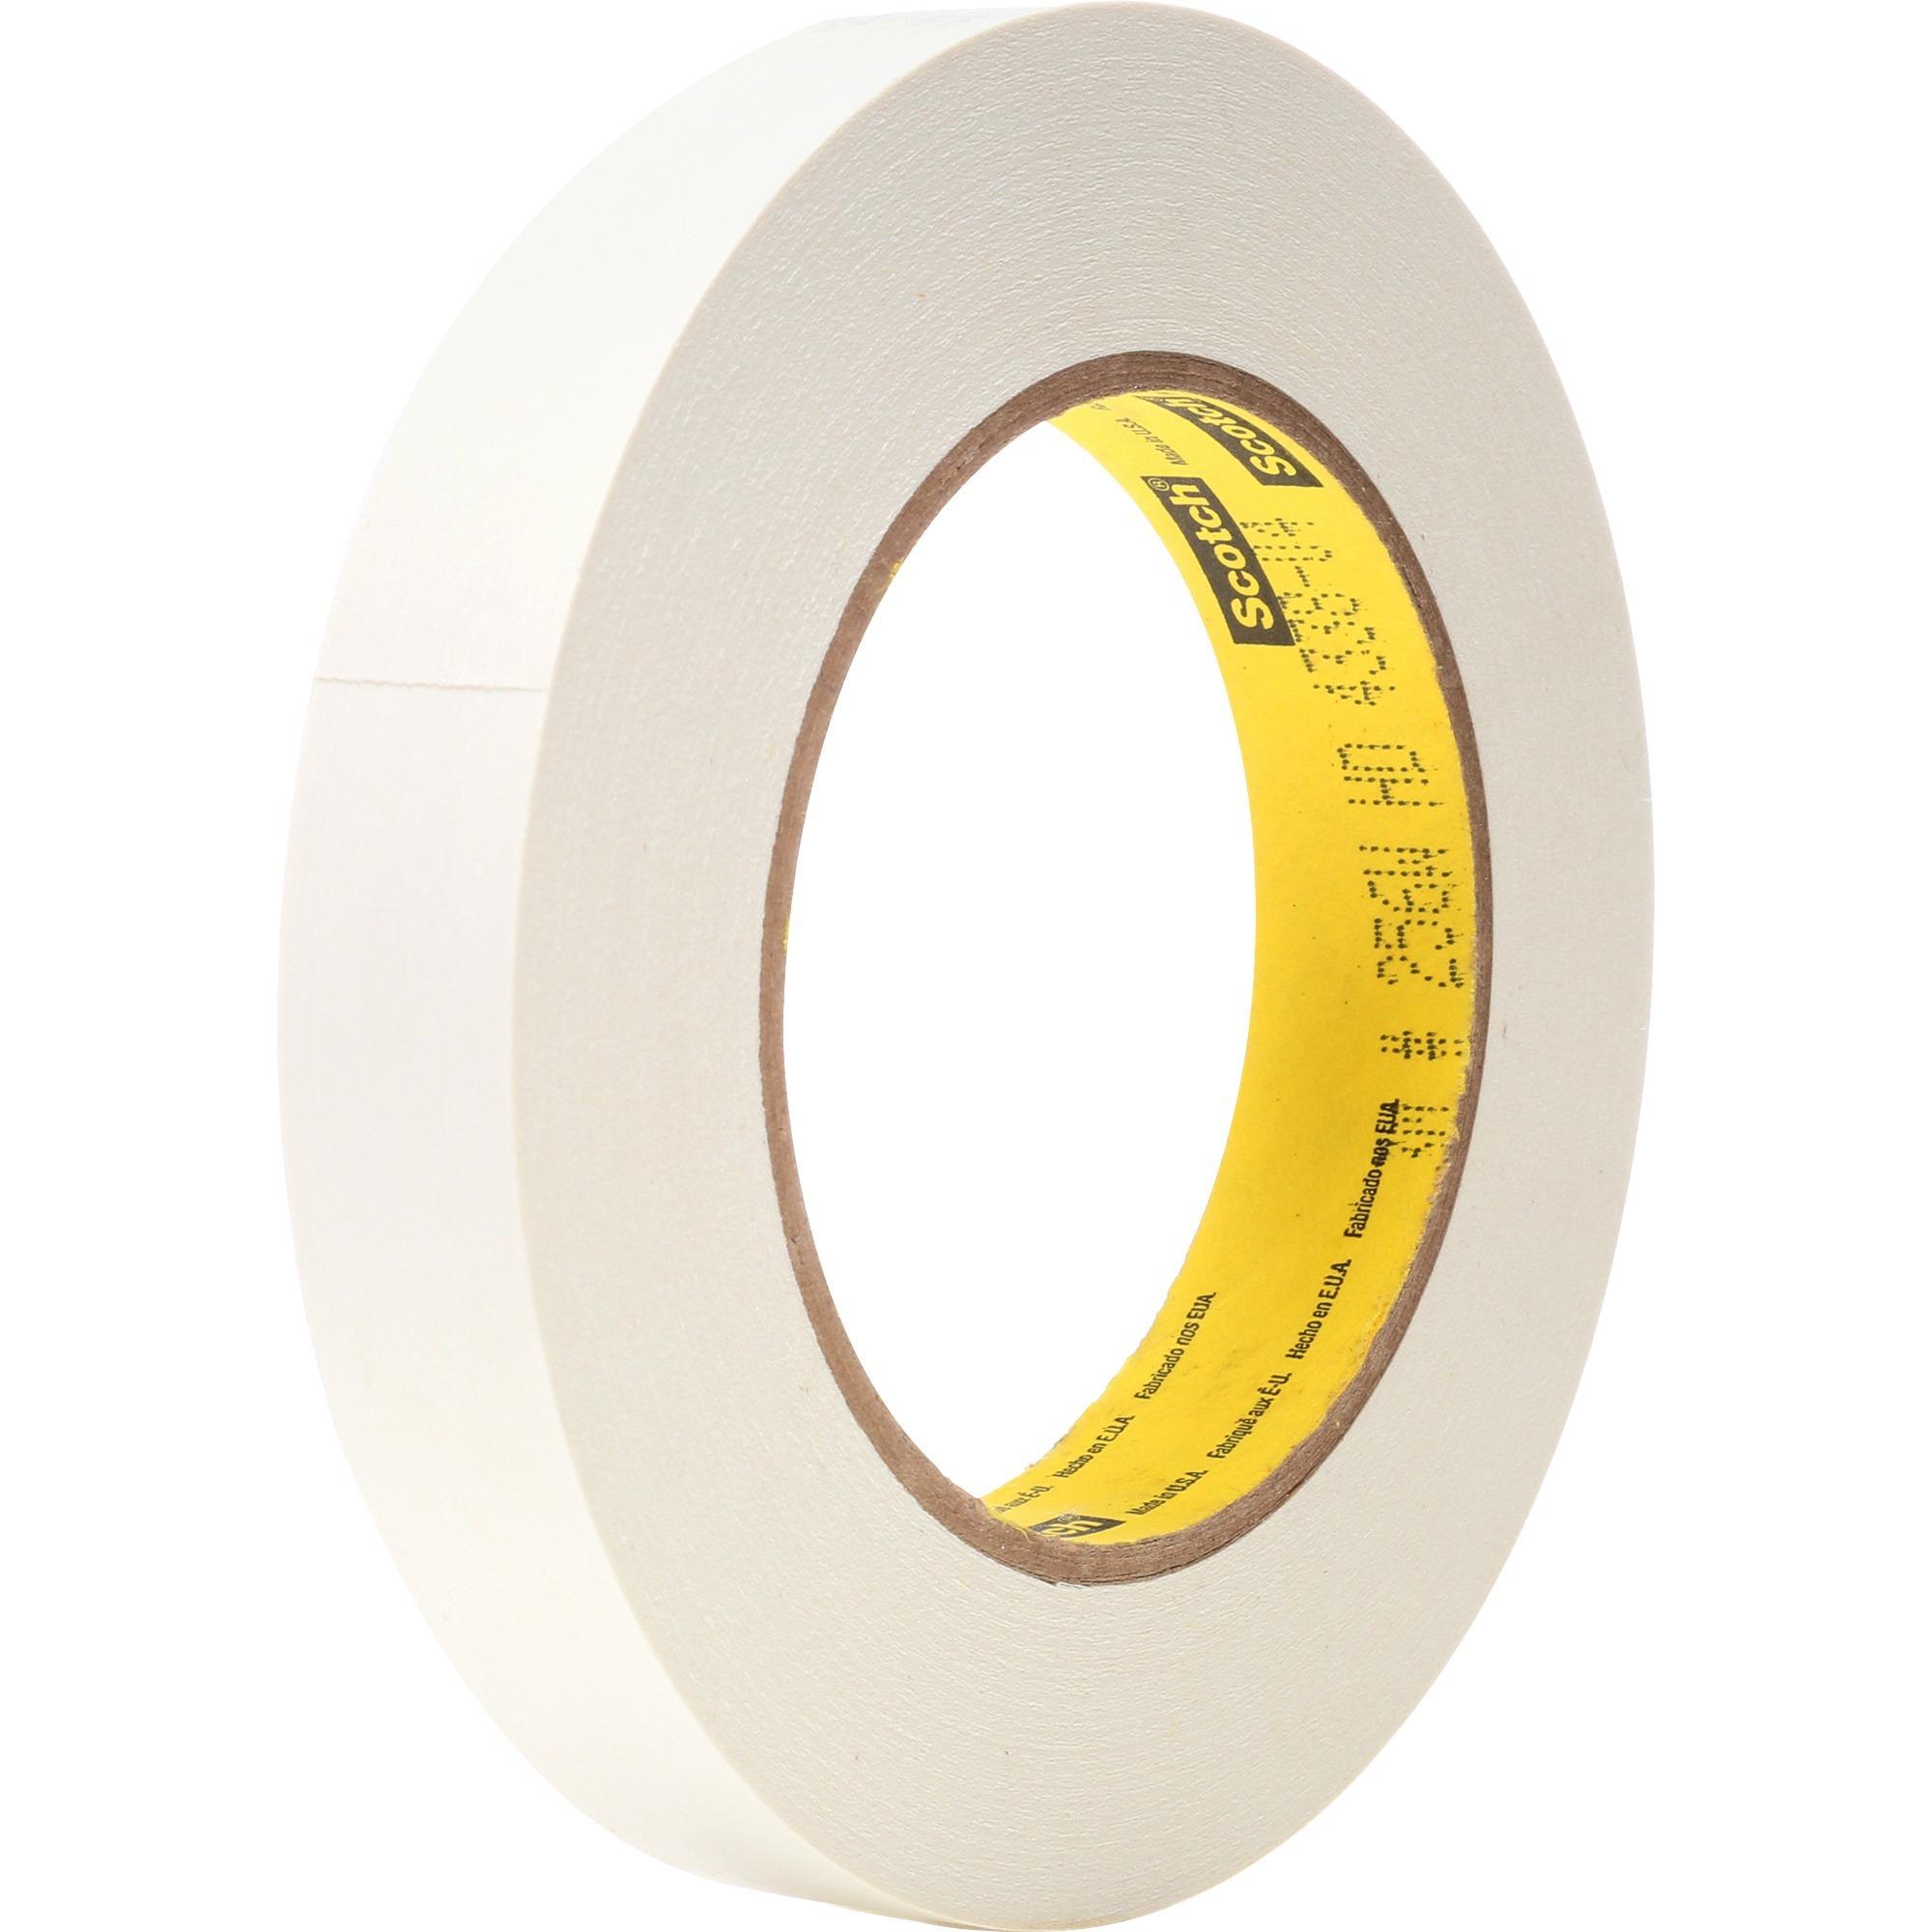 "256 Printable Flatback Paper Tape, 3/4"" x 60yds, 3"" Core, White"